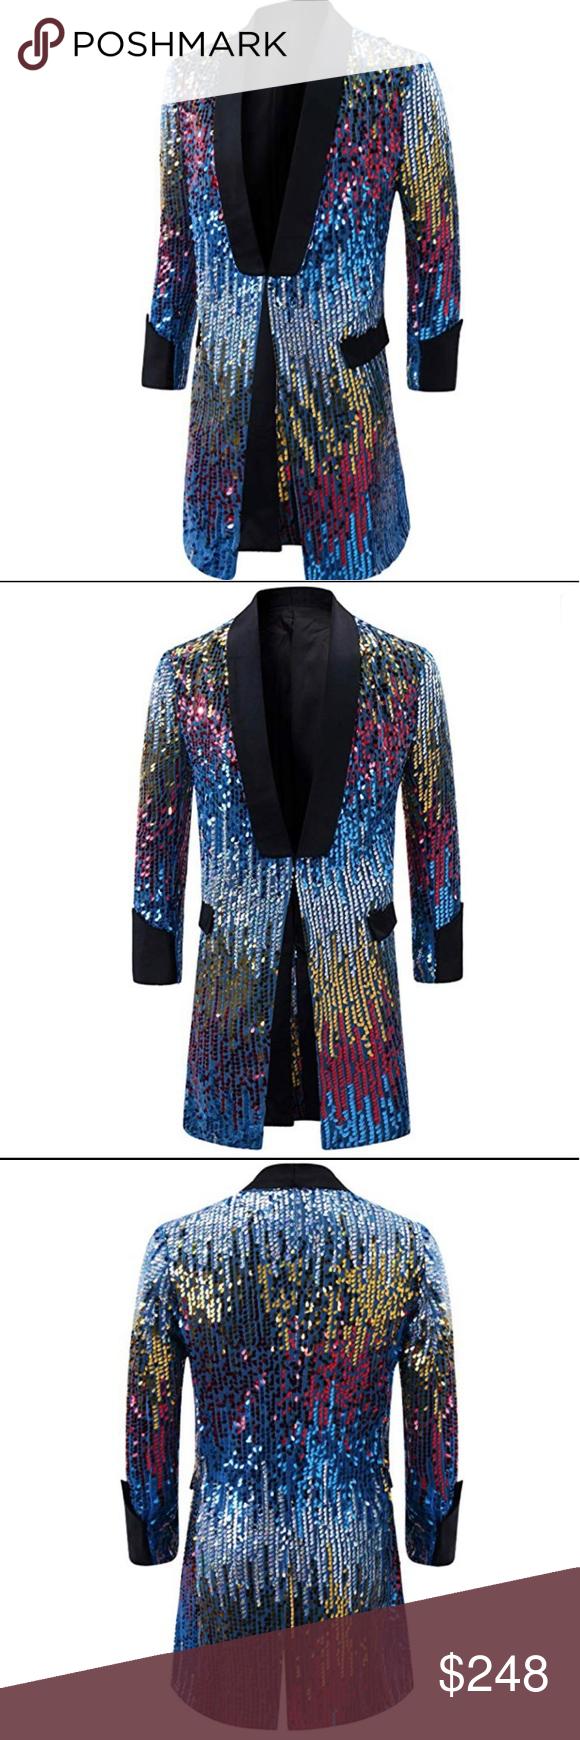 125d5650 Elton John Style Sequined Jacket? Life is a party Dress like it! Men's  Tuxedo Single-Breasted Party Show Suit Sequins Punk Jacket Blazer 20%  Cotton + 80% ...